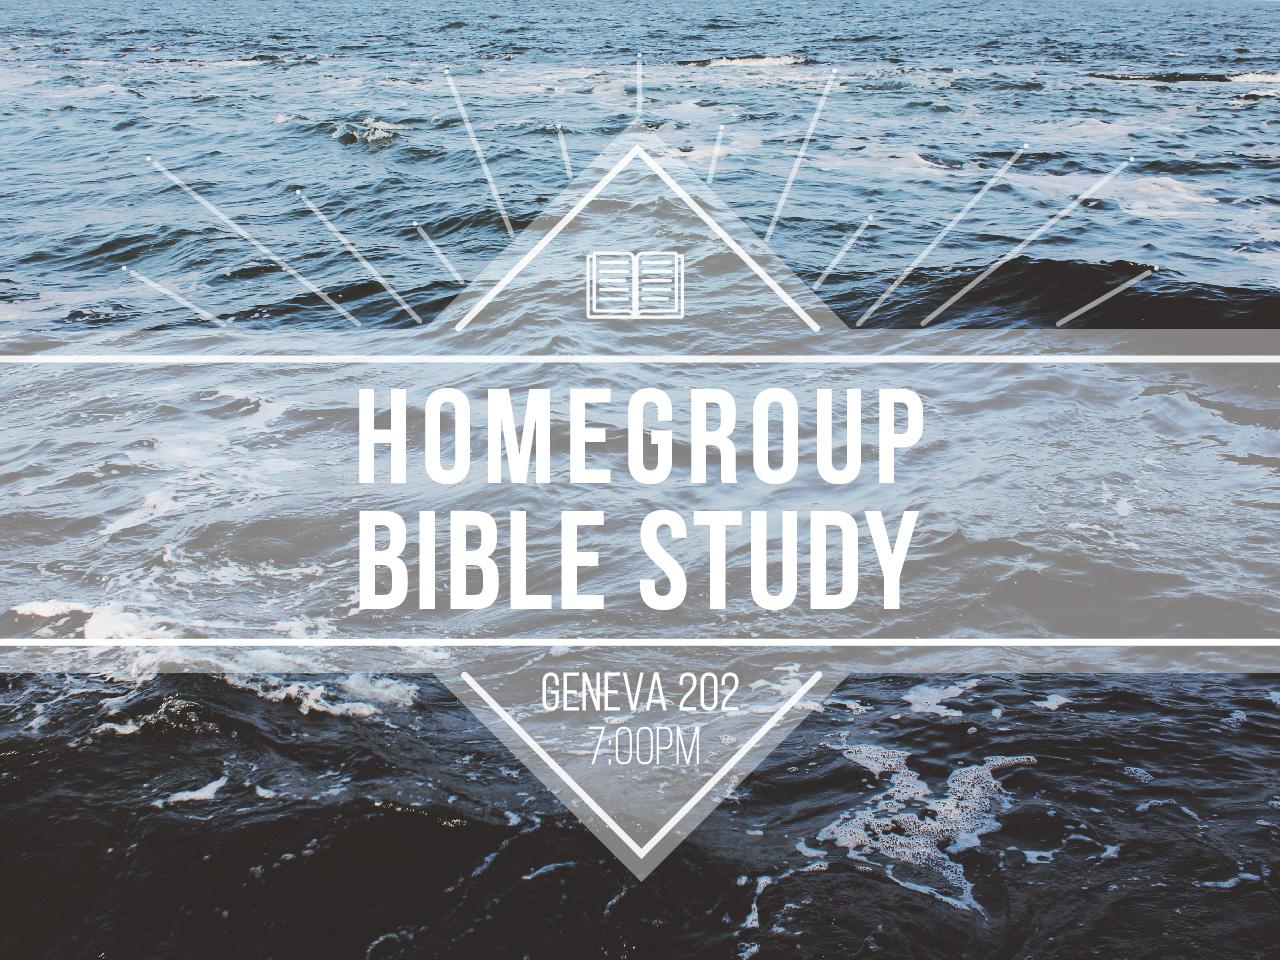 acts2fellowship-christian-fellowship-college-berkeley-a2f5-homegroup-bible-study